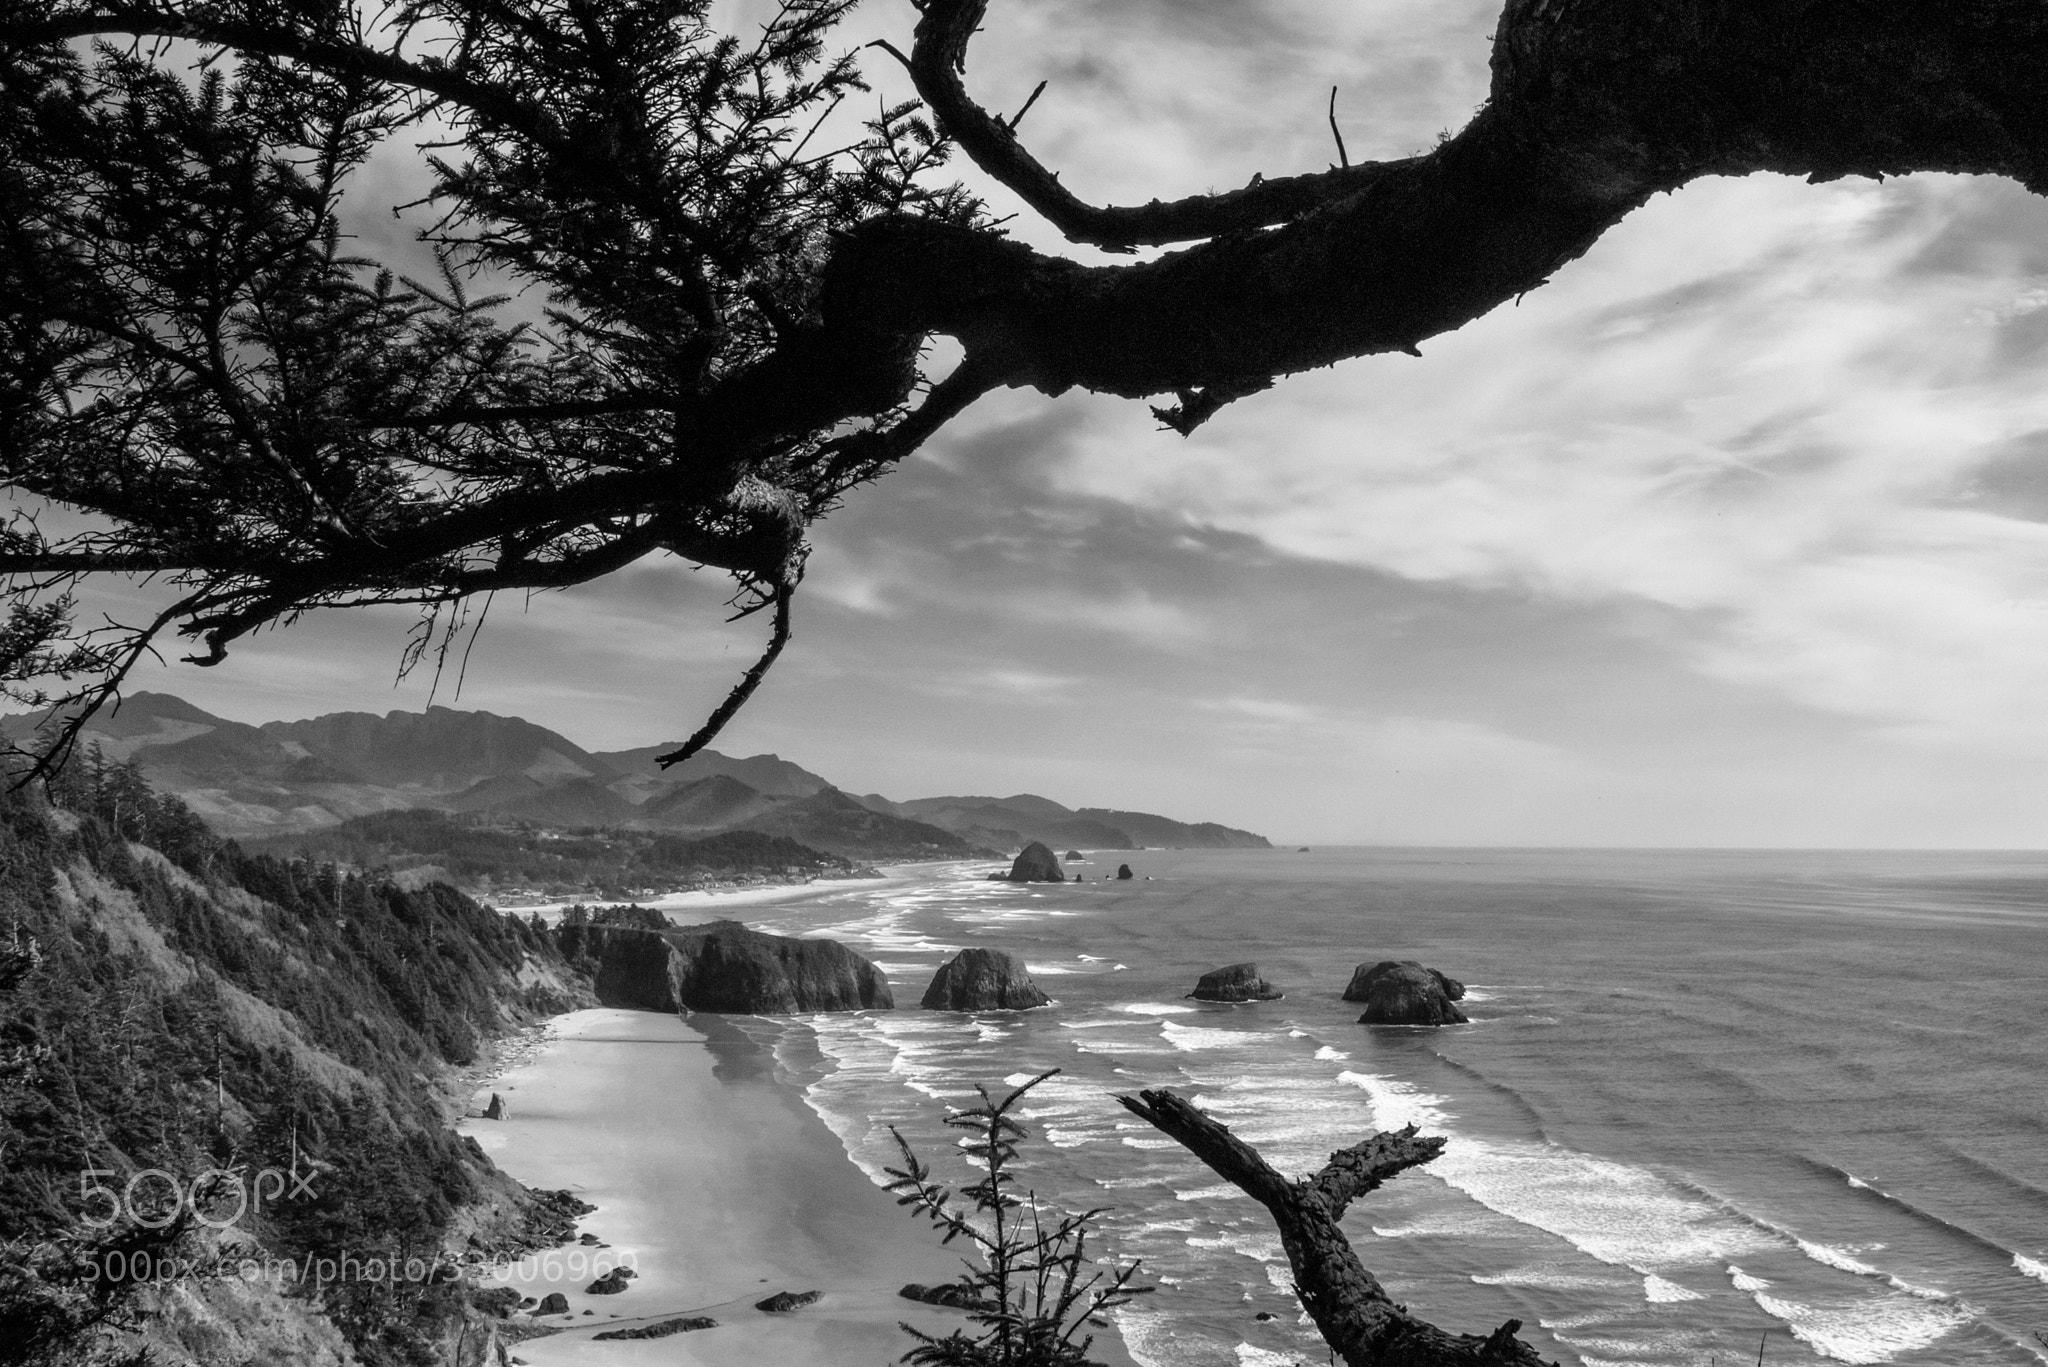 Photograph Oregon Coast by Keith Skelton on 500px